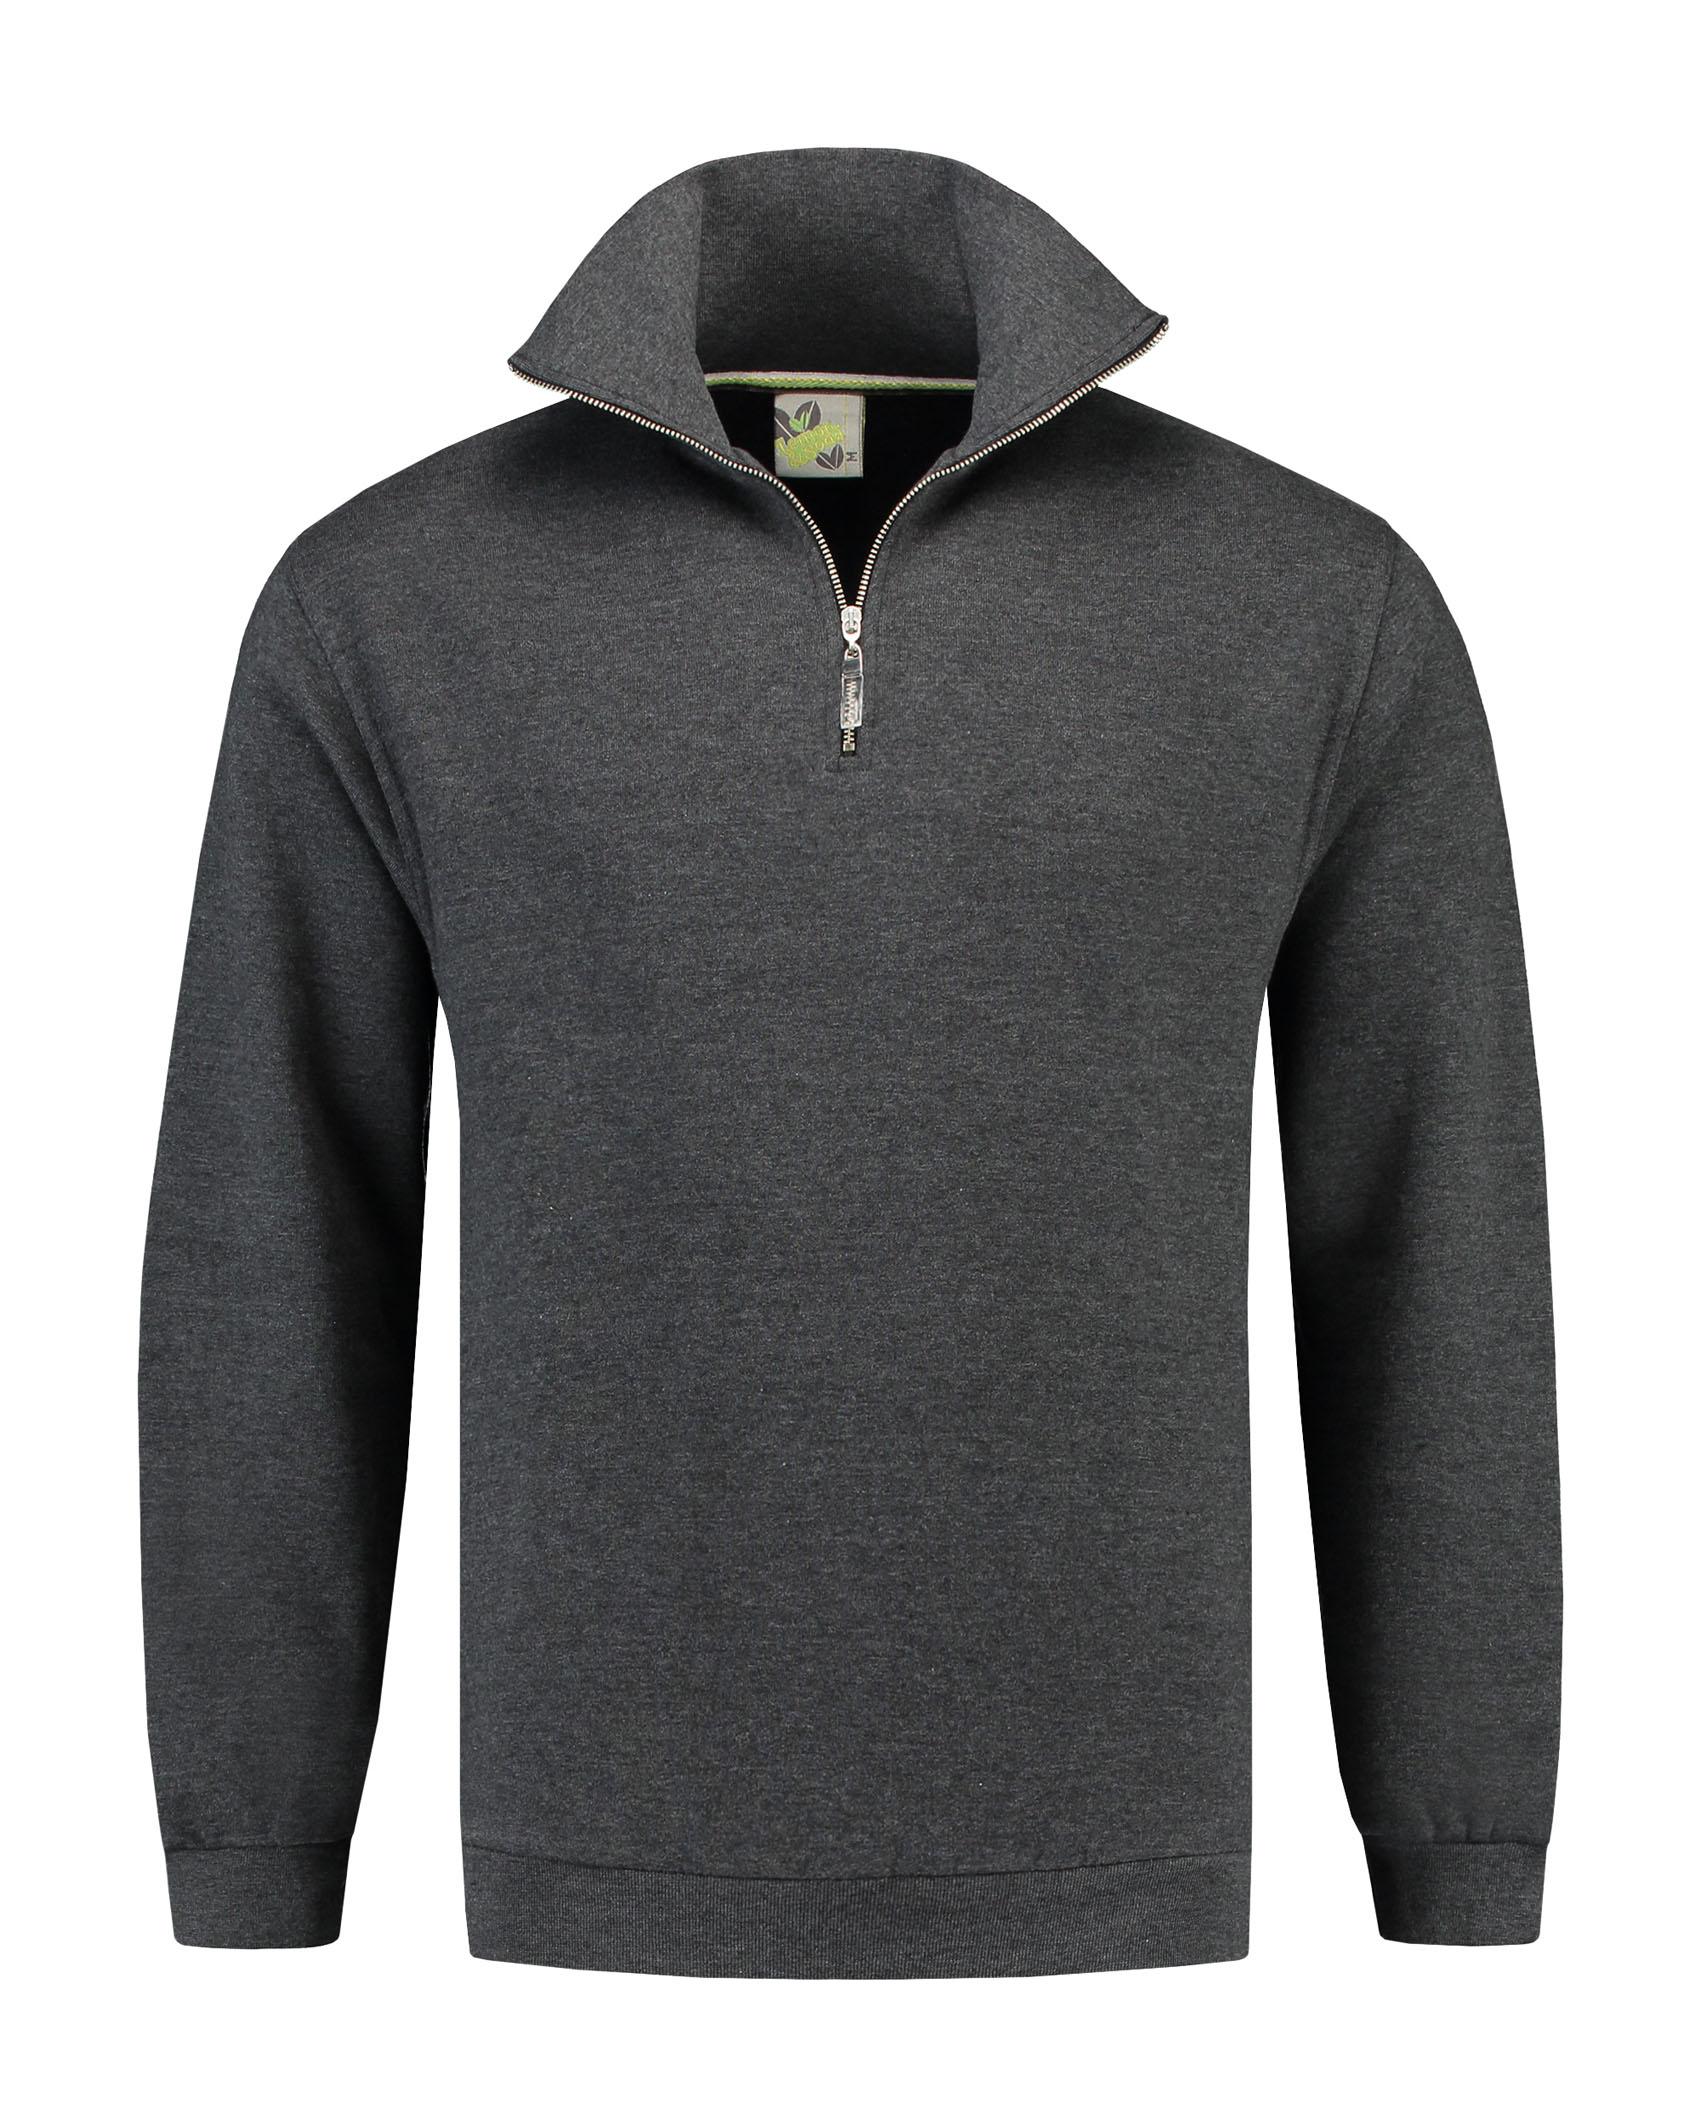 L&S Sweater Zip